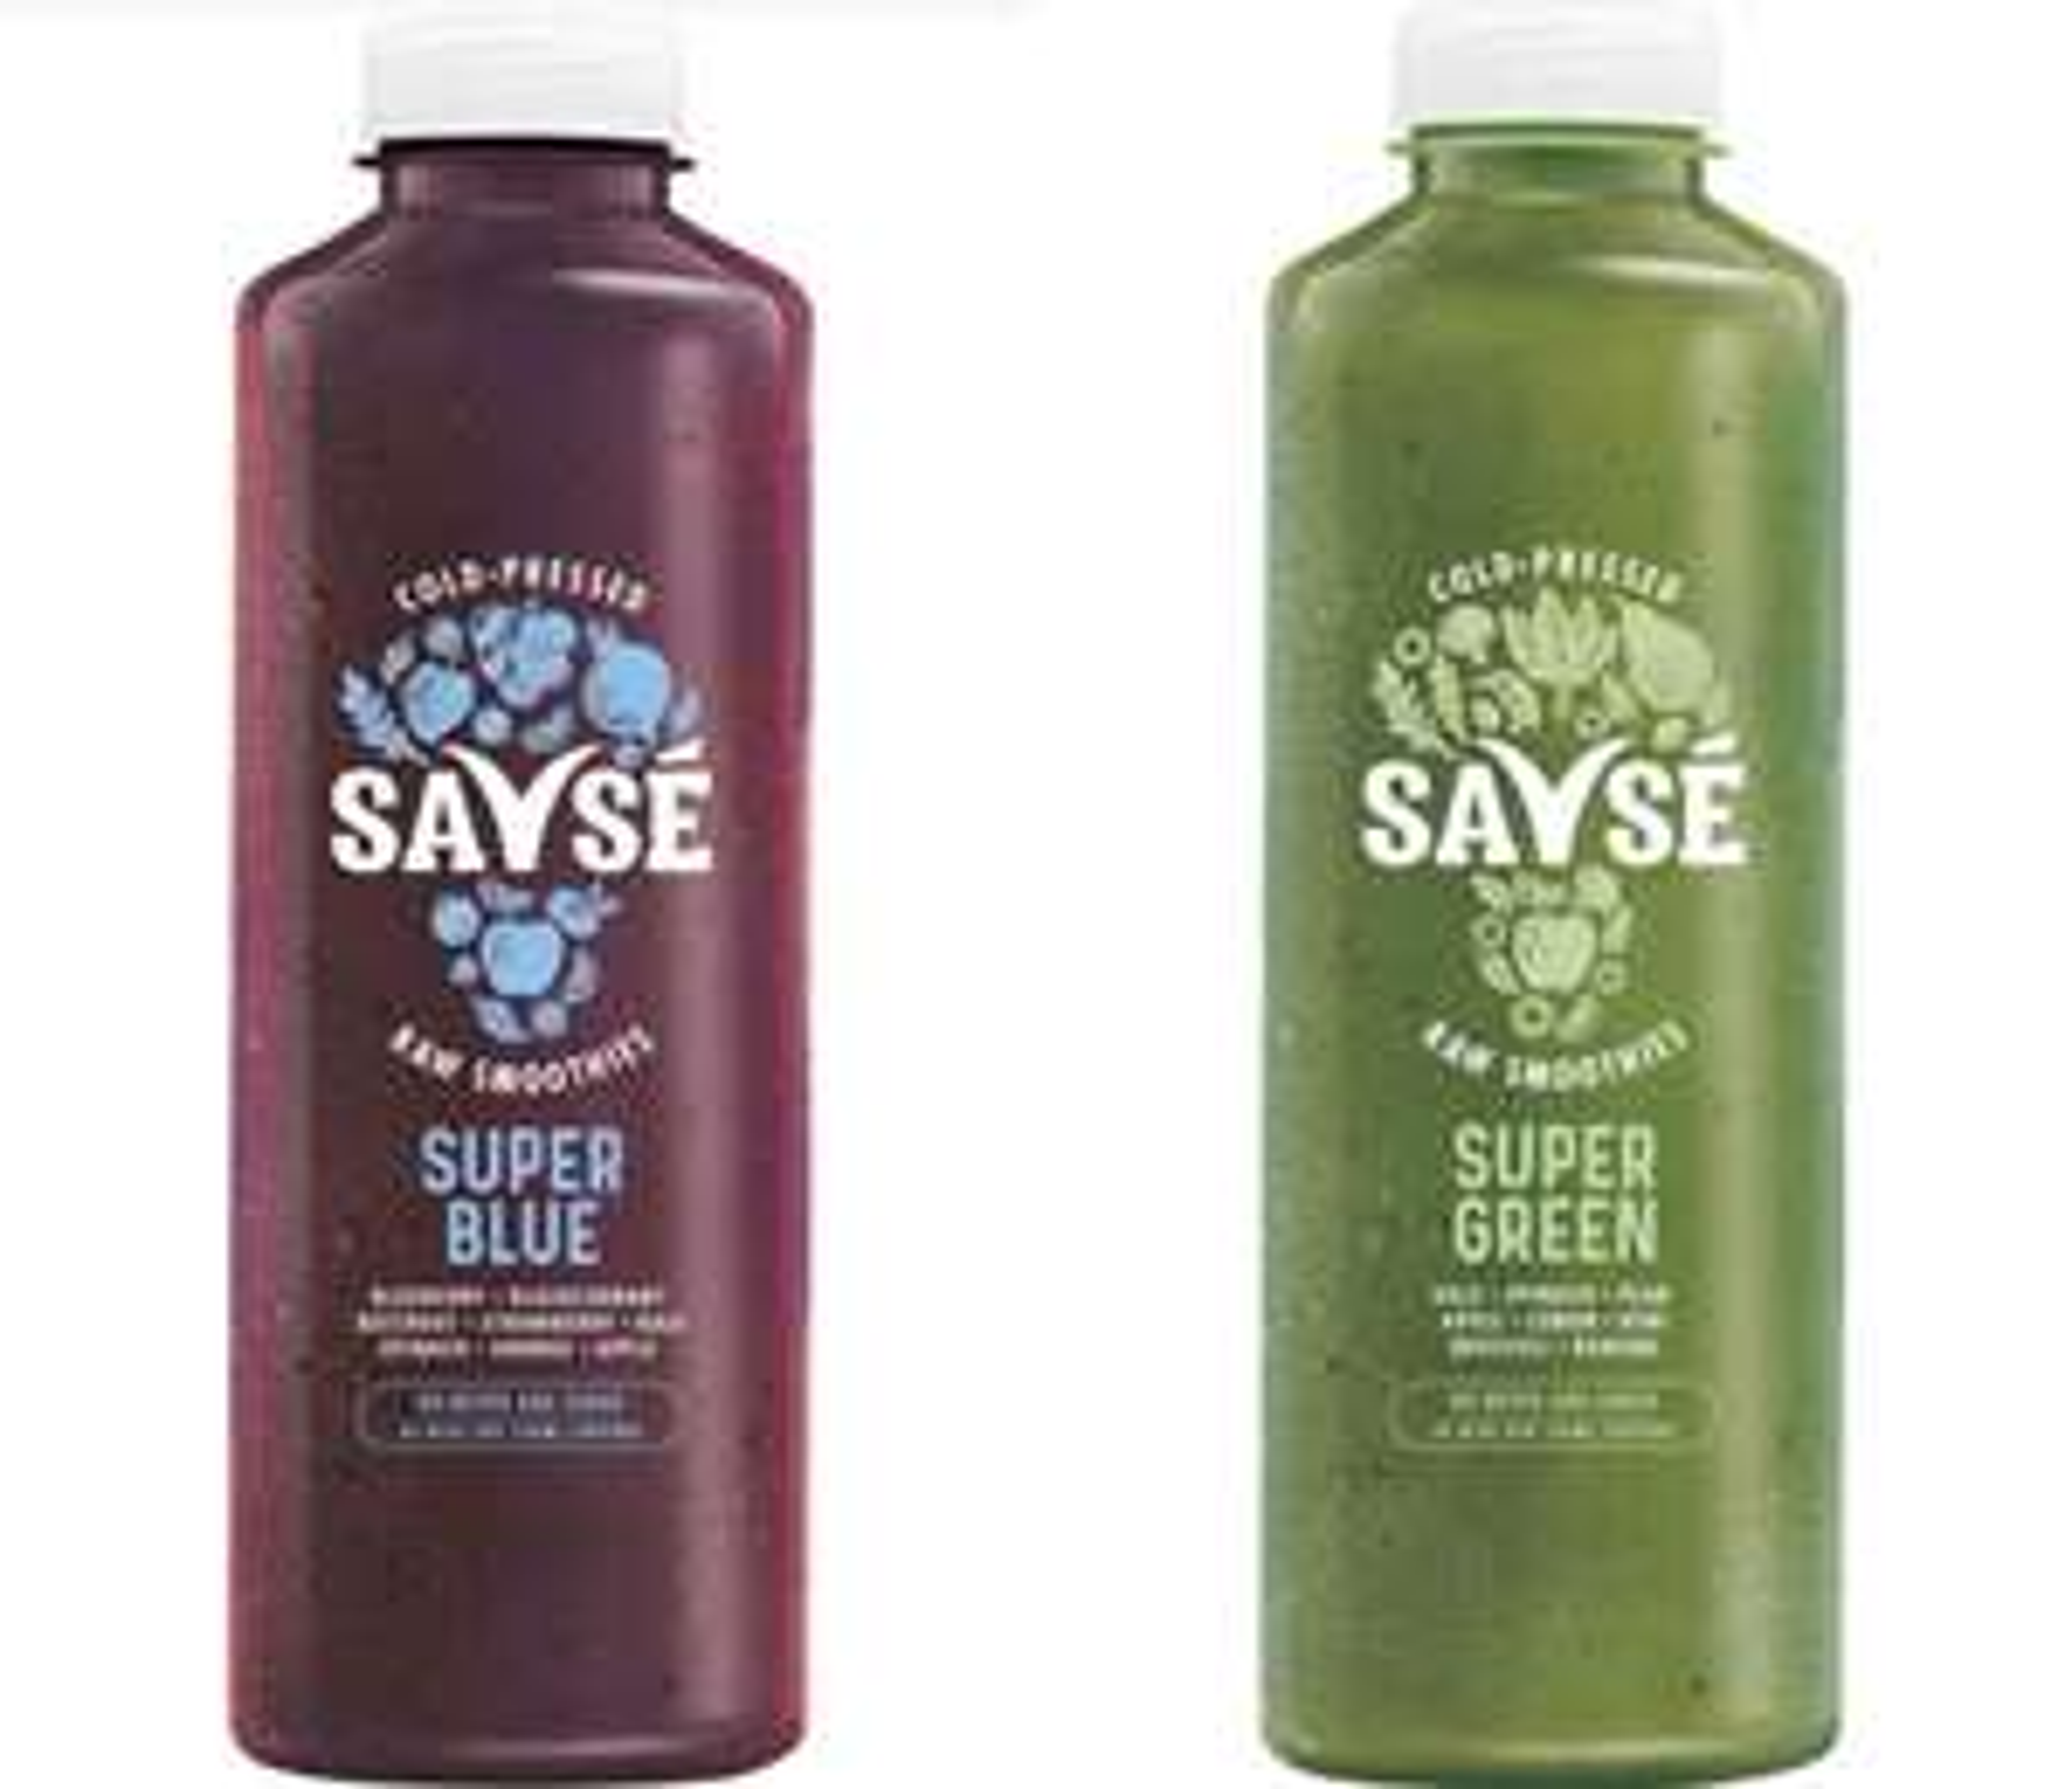 Savse Super Blue/Green Smoothie 750ml -  £2.50(C/B Available) @Sainsbury's